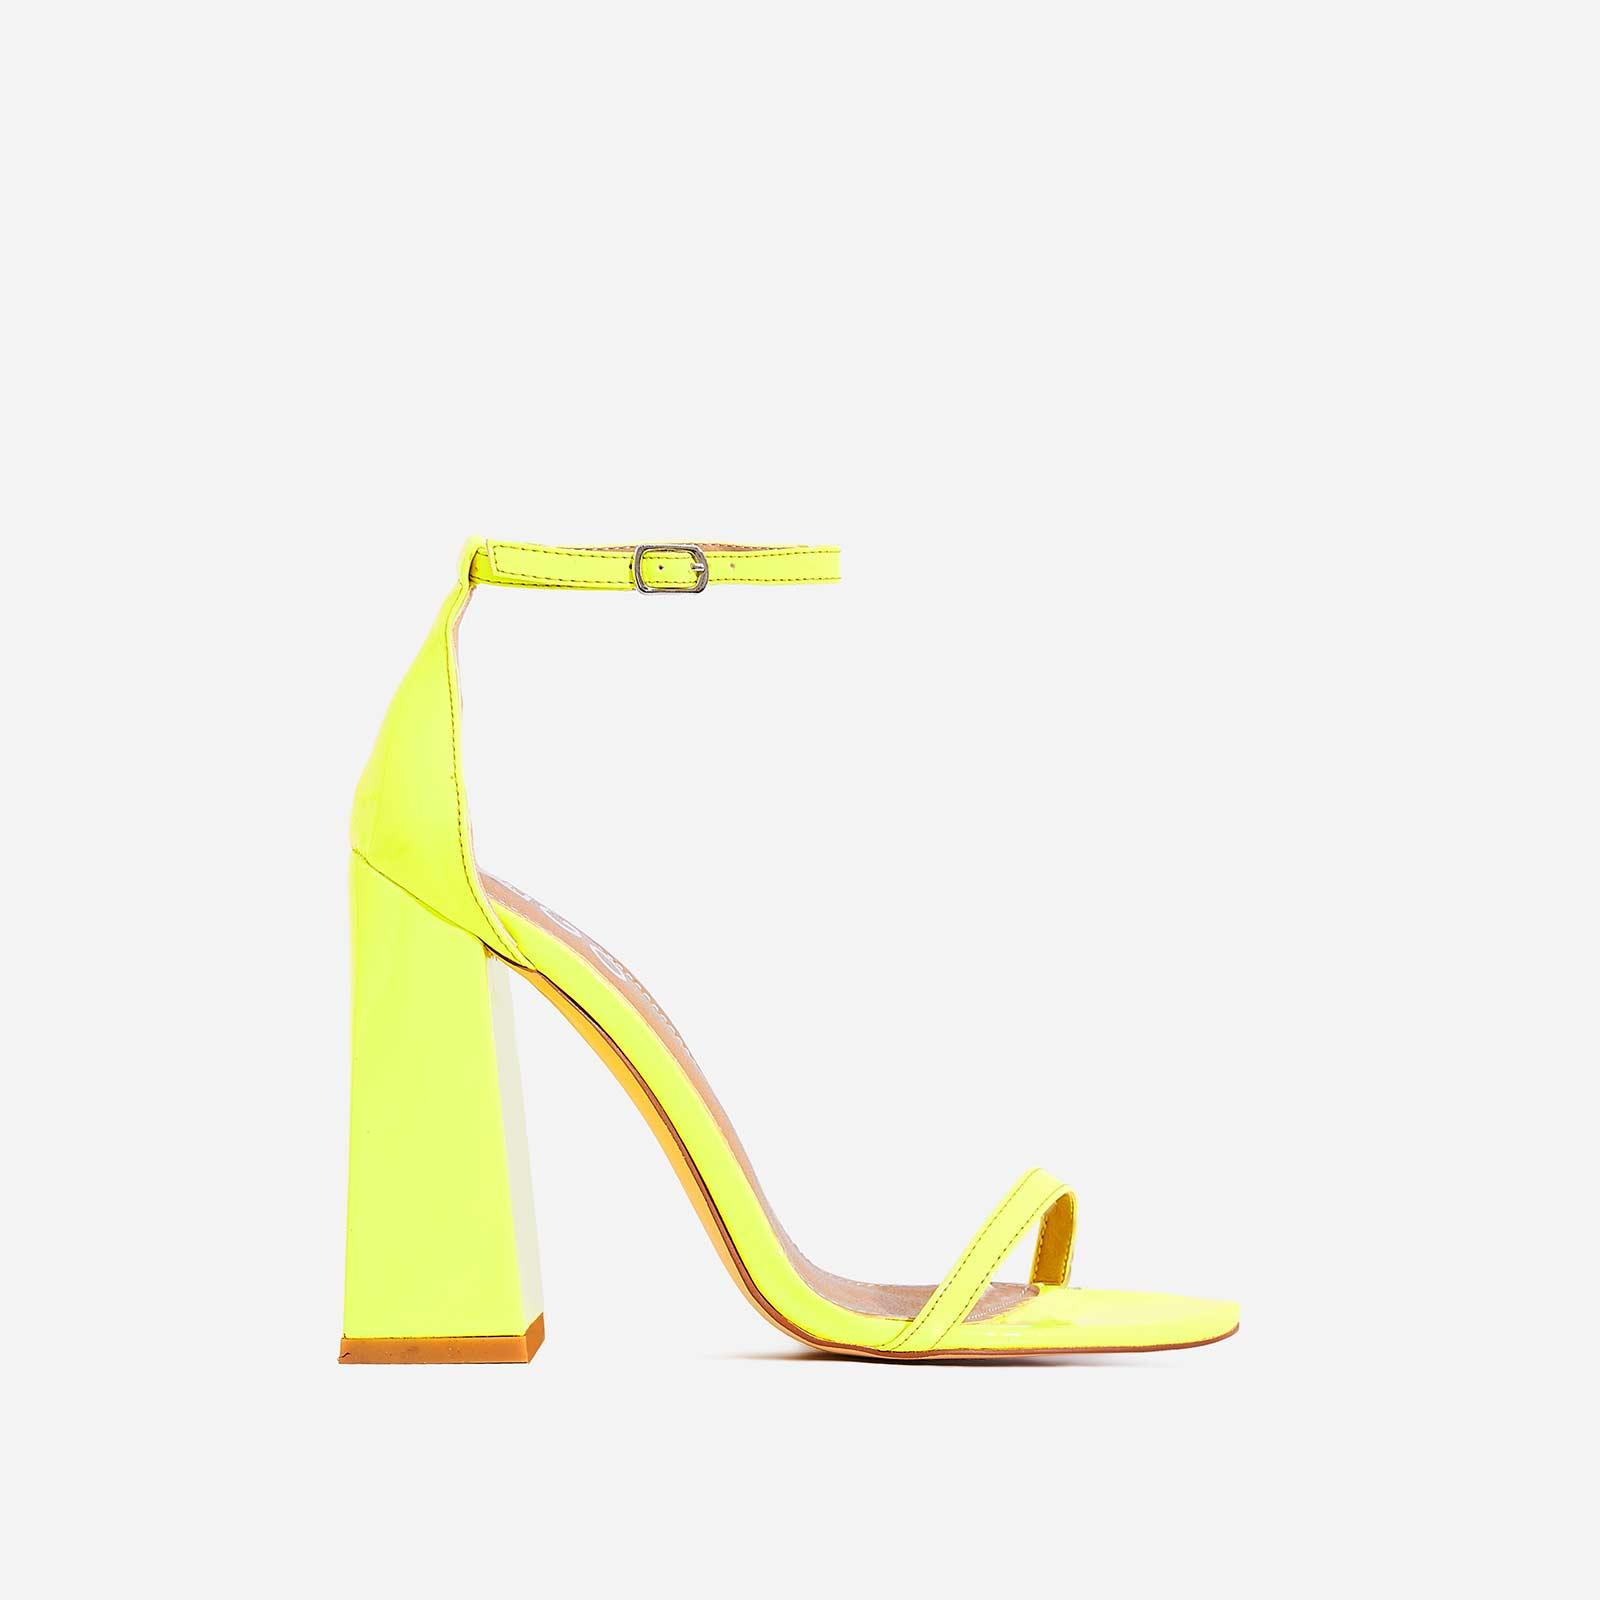 Atomic Square Block Heel  In Neon Yellow Patent